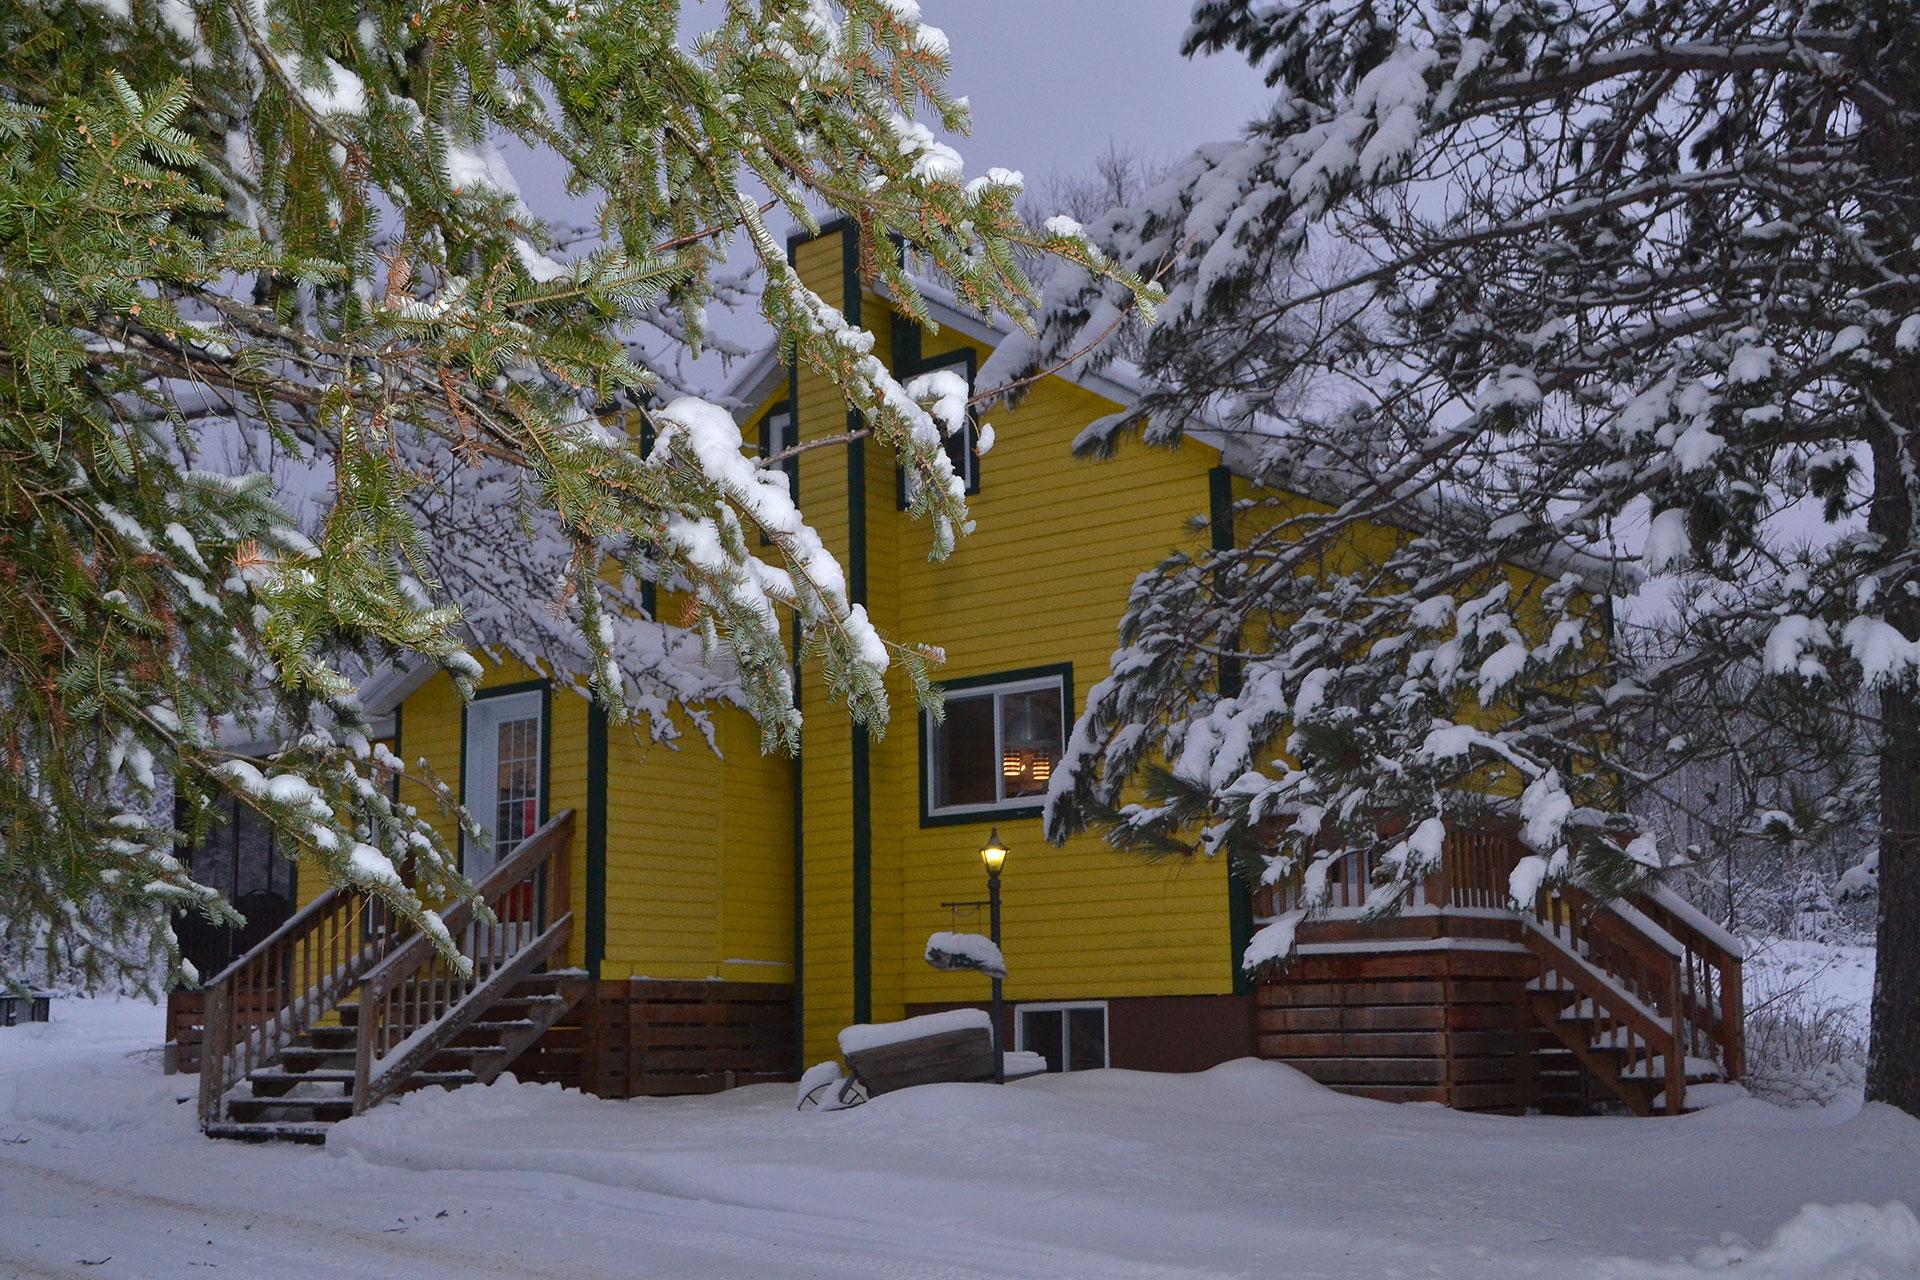 La Maison jaune